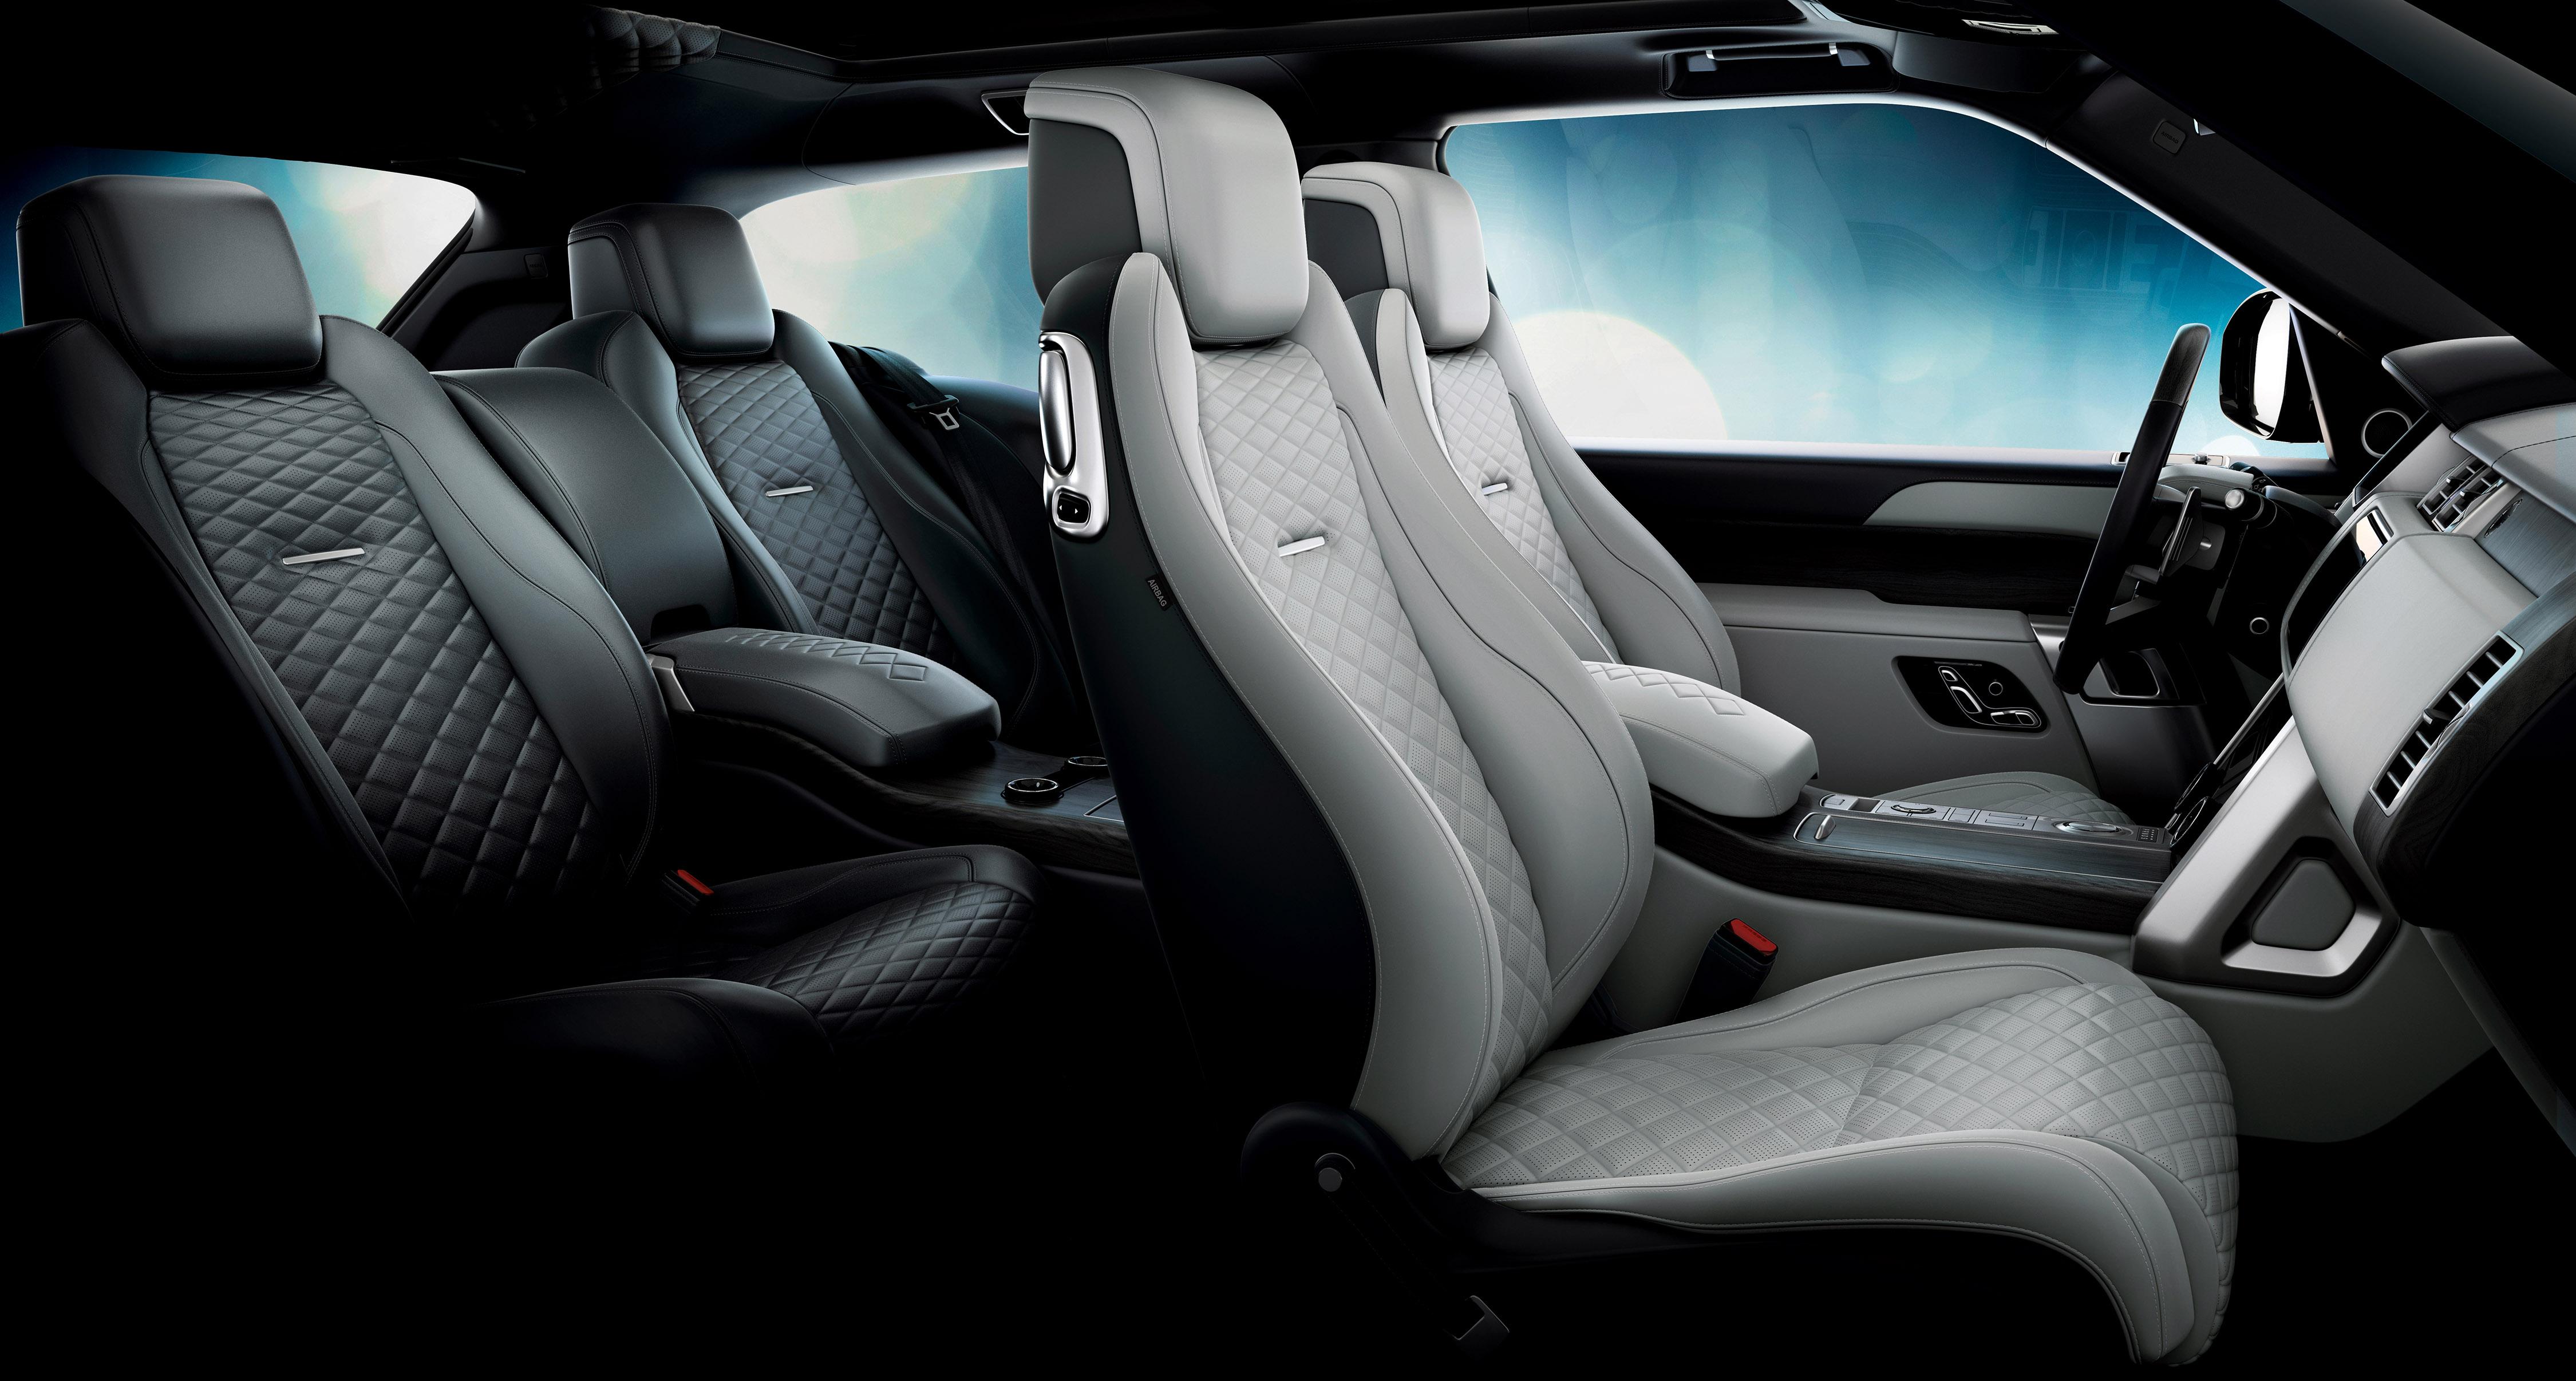 273758 08 range rover sv coupe 08dffd original 1519909284